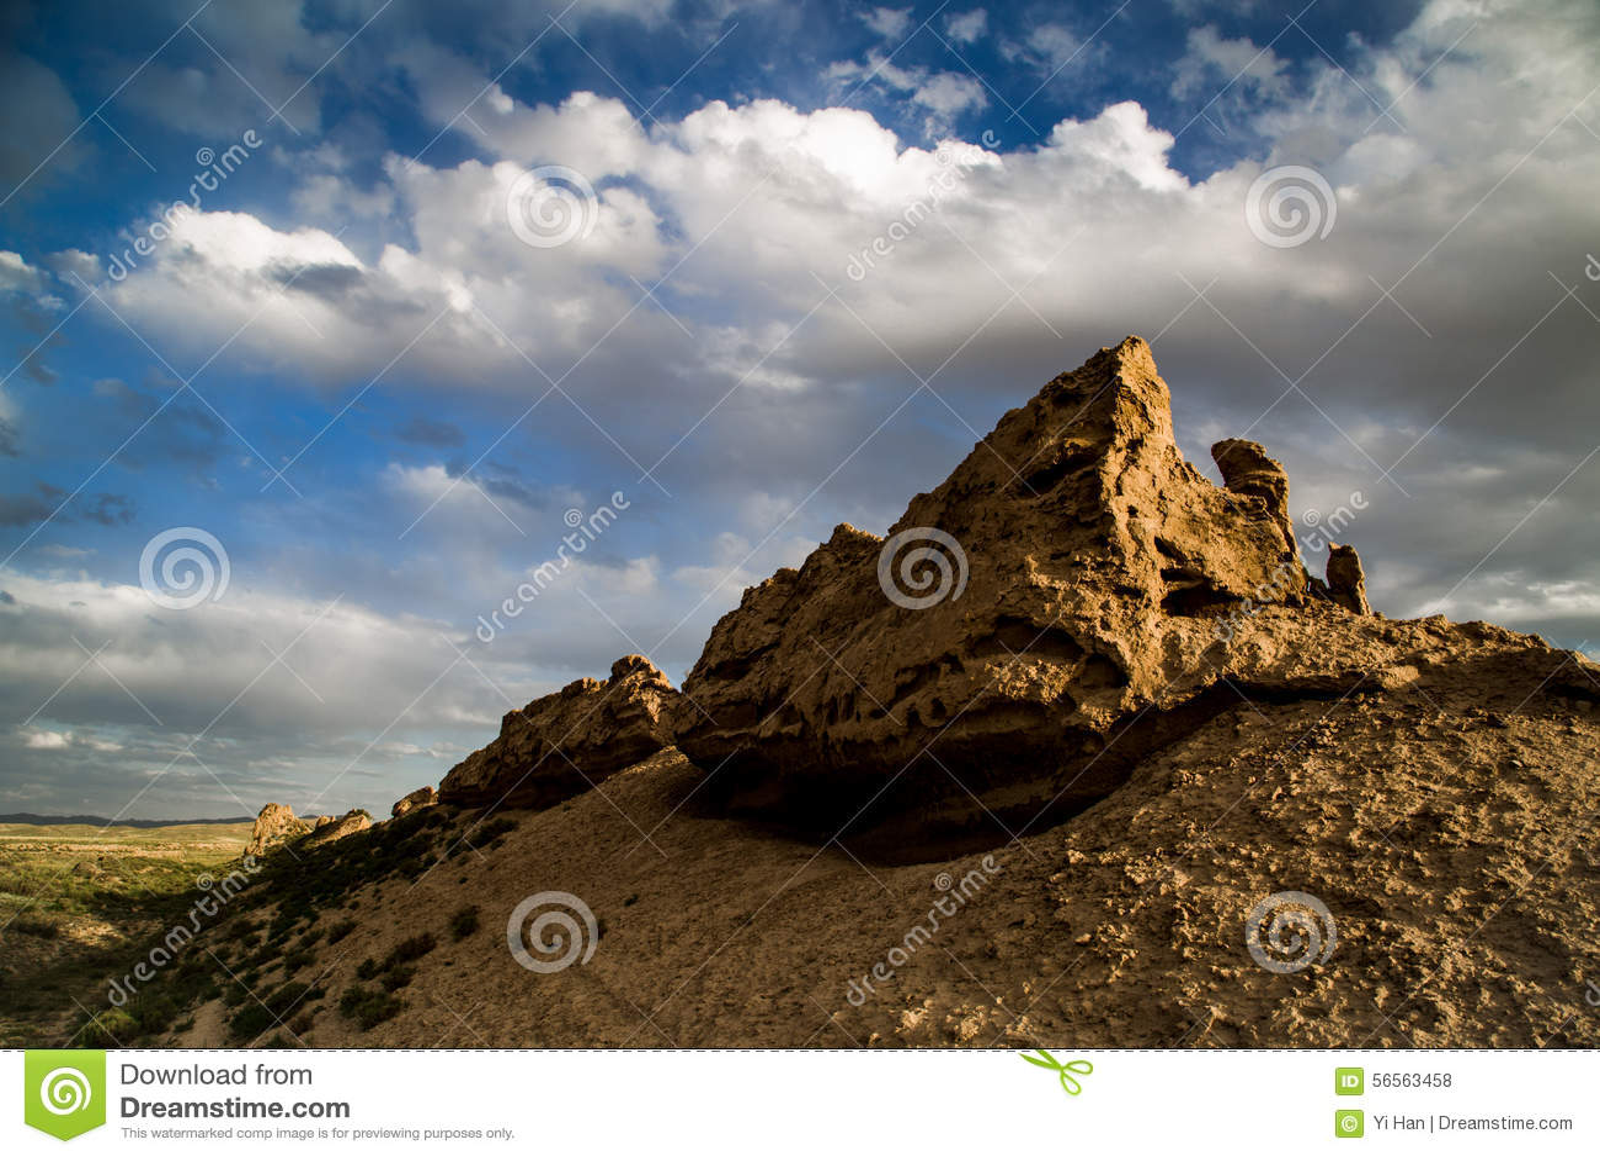 Download Αρχαίος το Σινικό Τείχος σε Gansu, Κίνα Στοκ Εικόνες - εικόνα από τοπίο, σύννεφο: 56563458